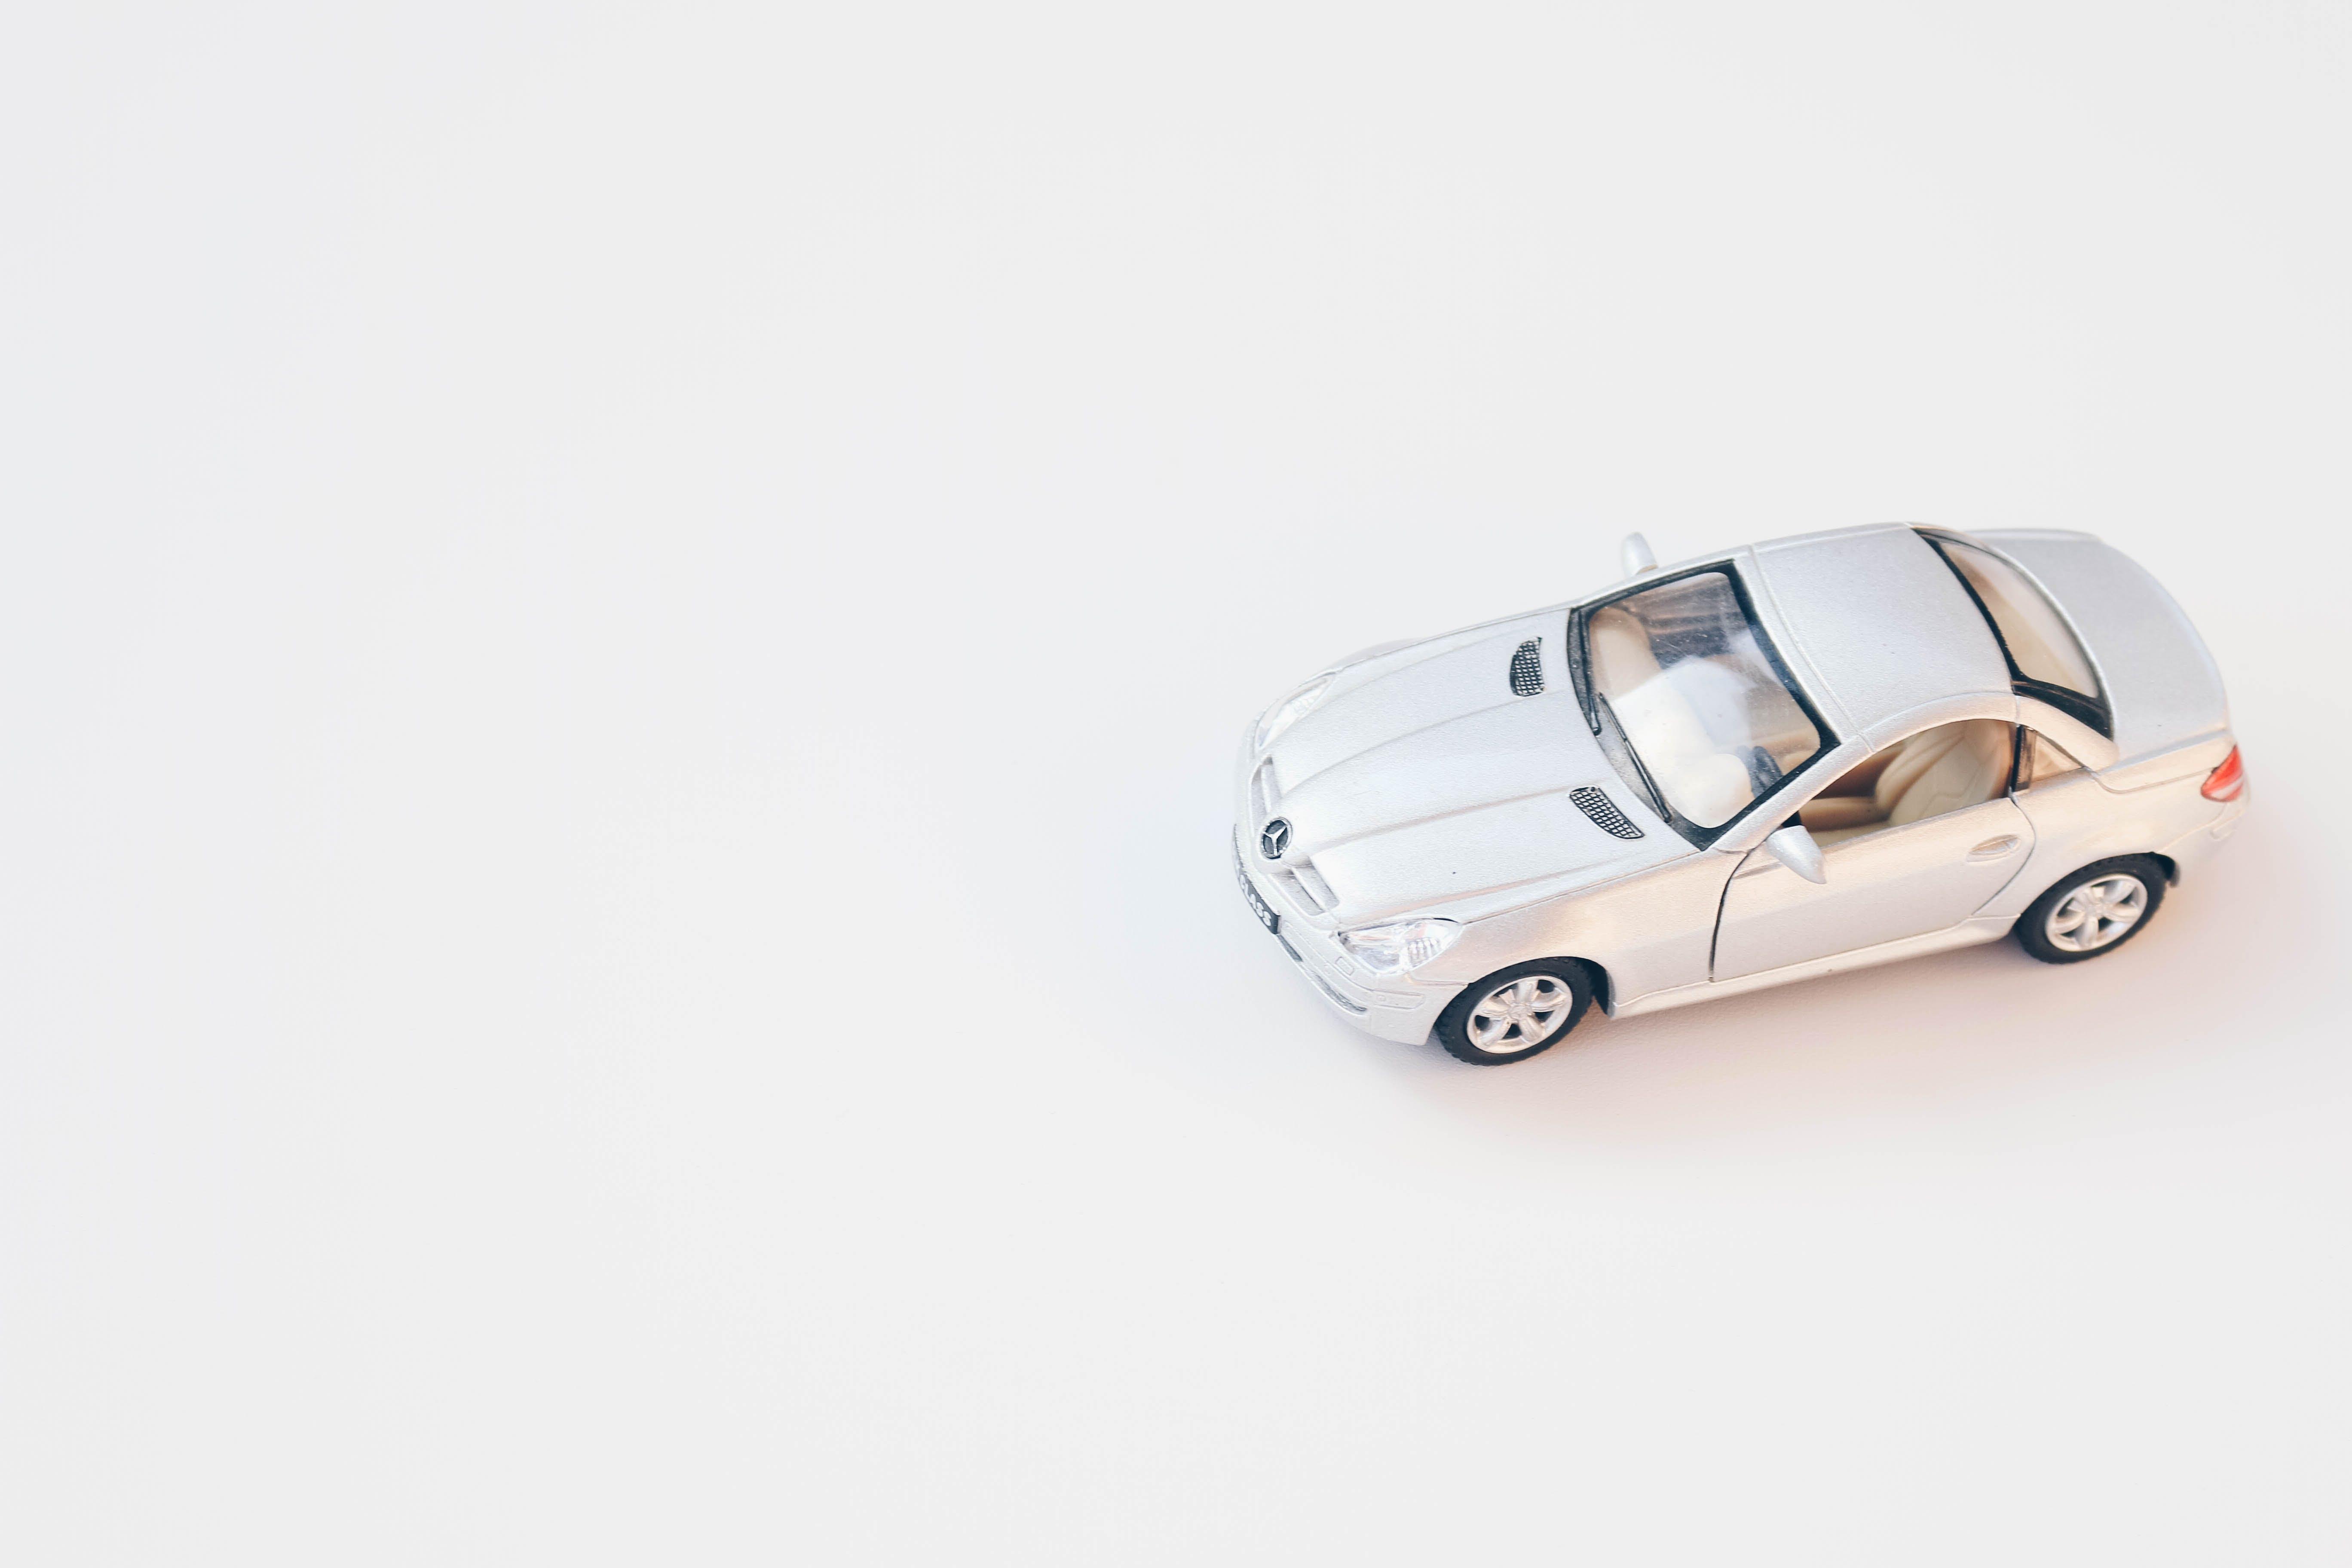 Free stock photo of car, Car toys, mercedes, mercedes benz